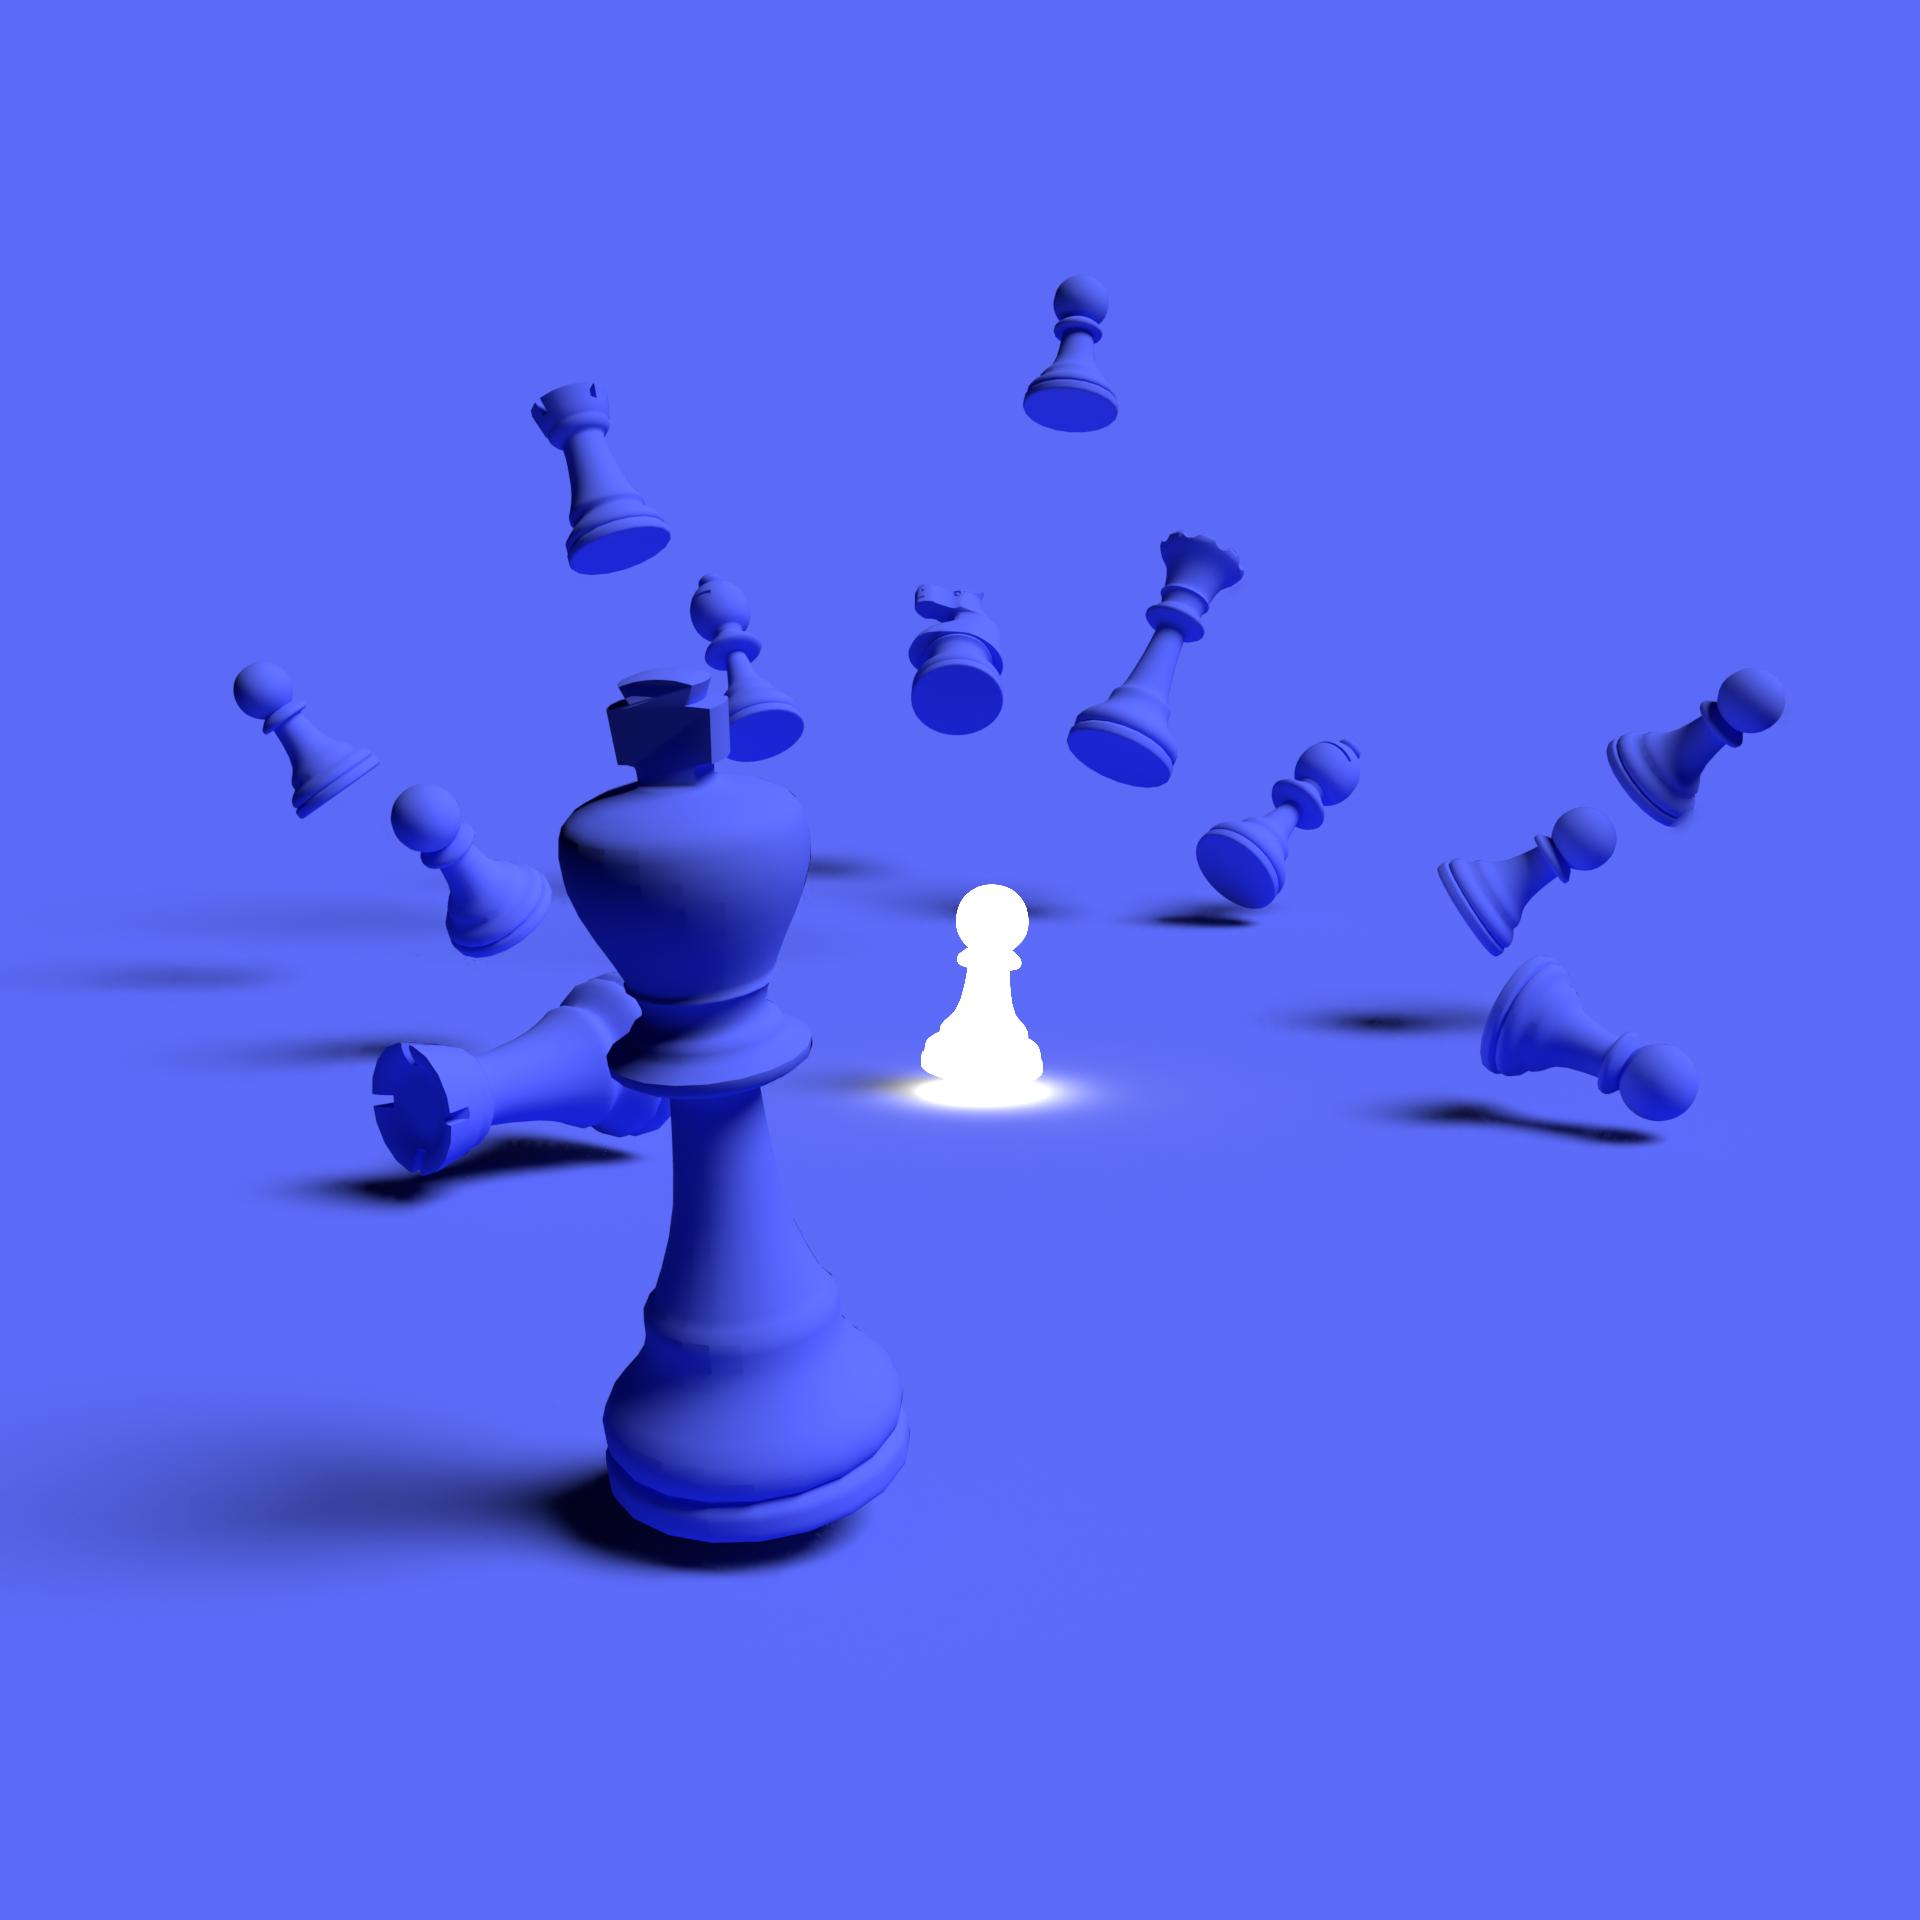 Chess Clay2 Aktuelle Ansicht